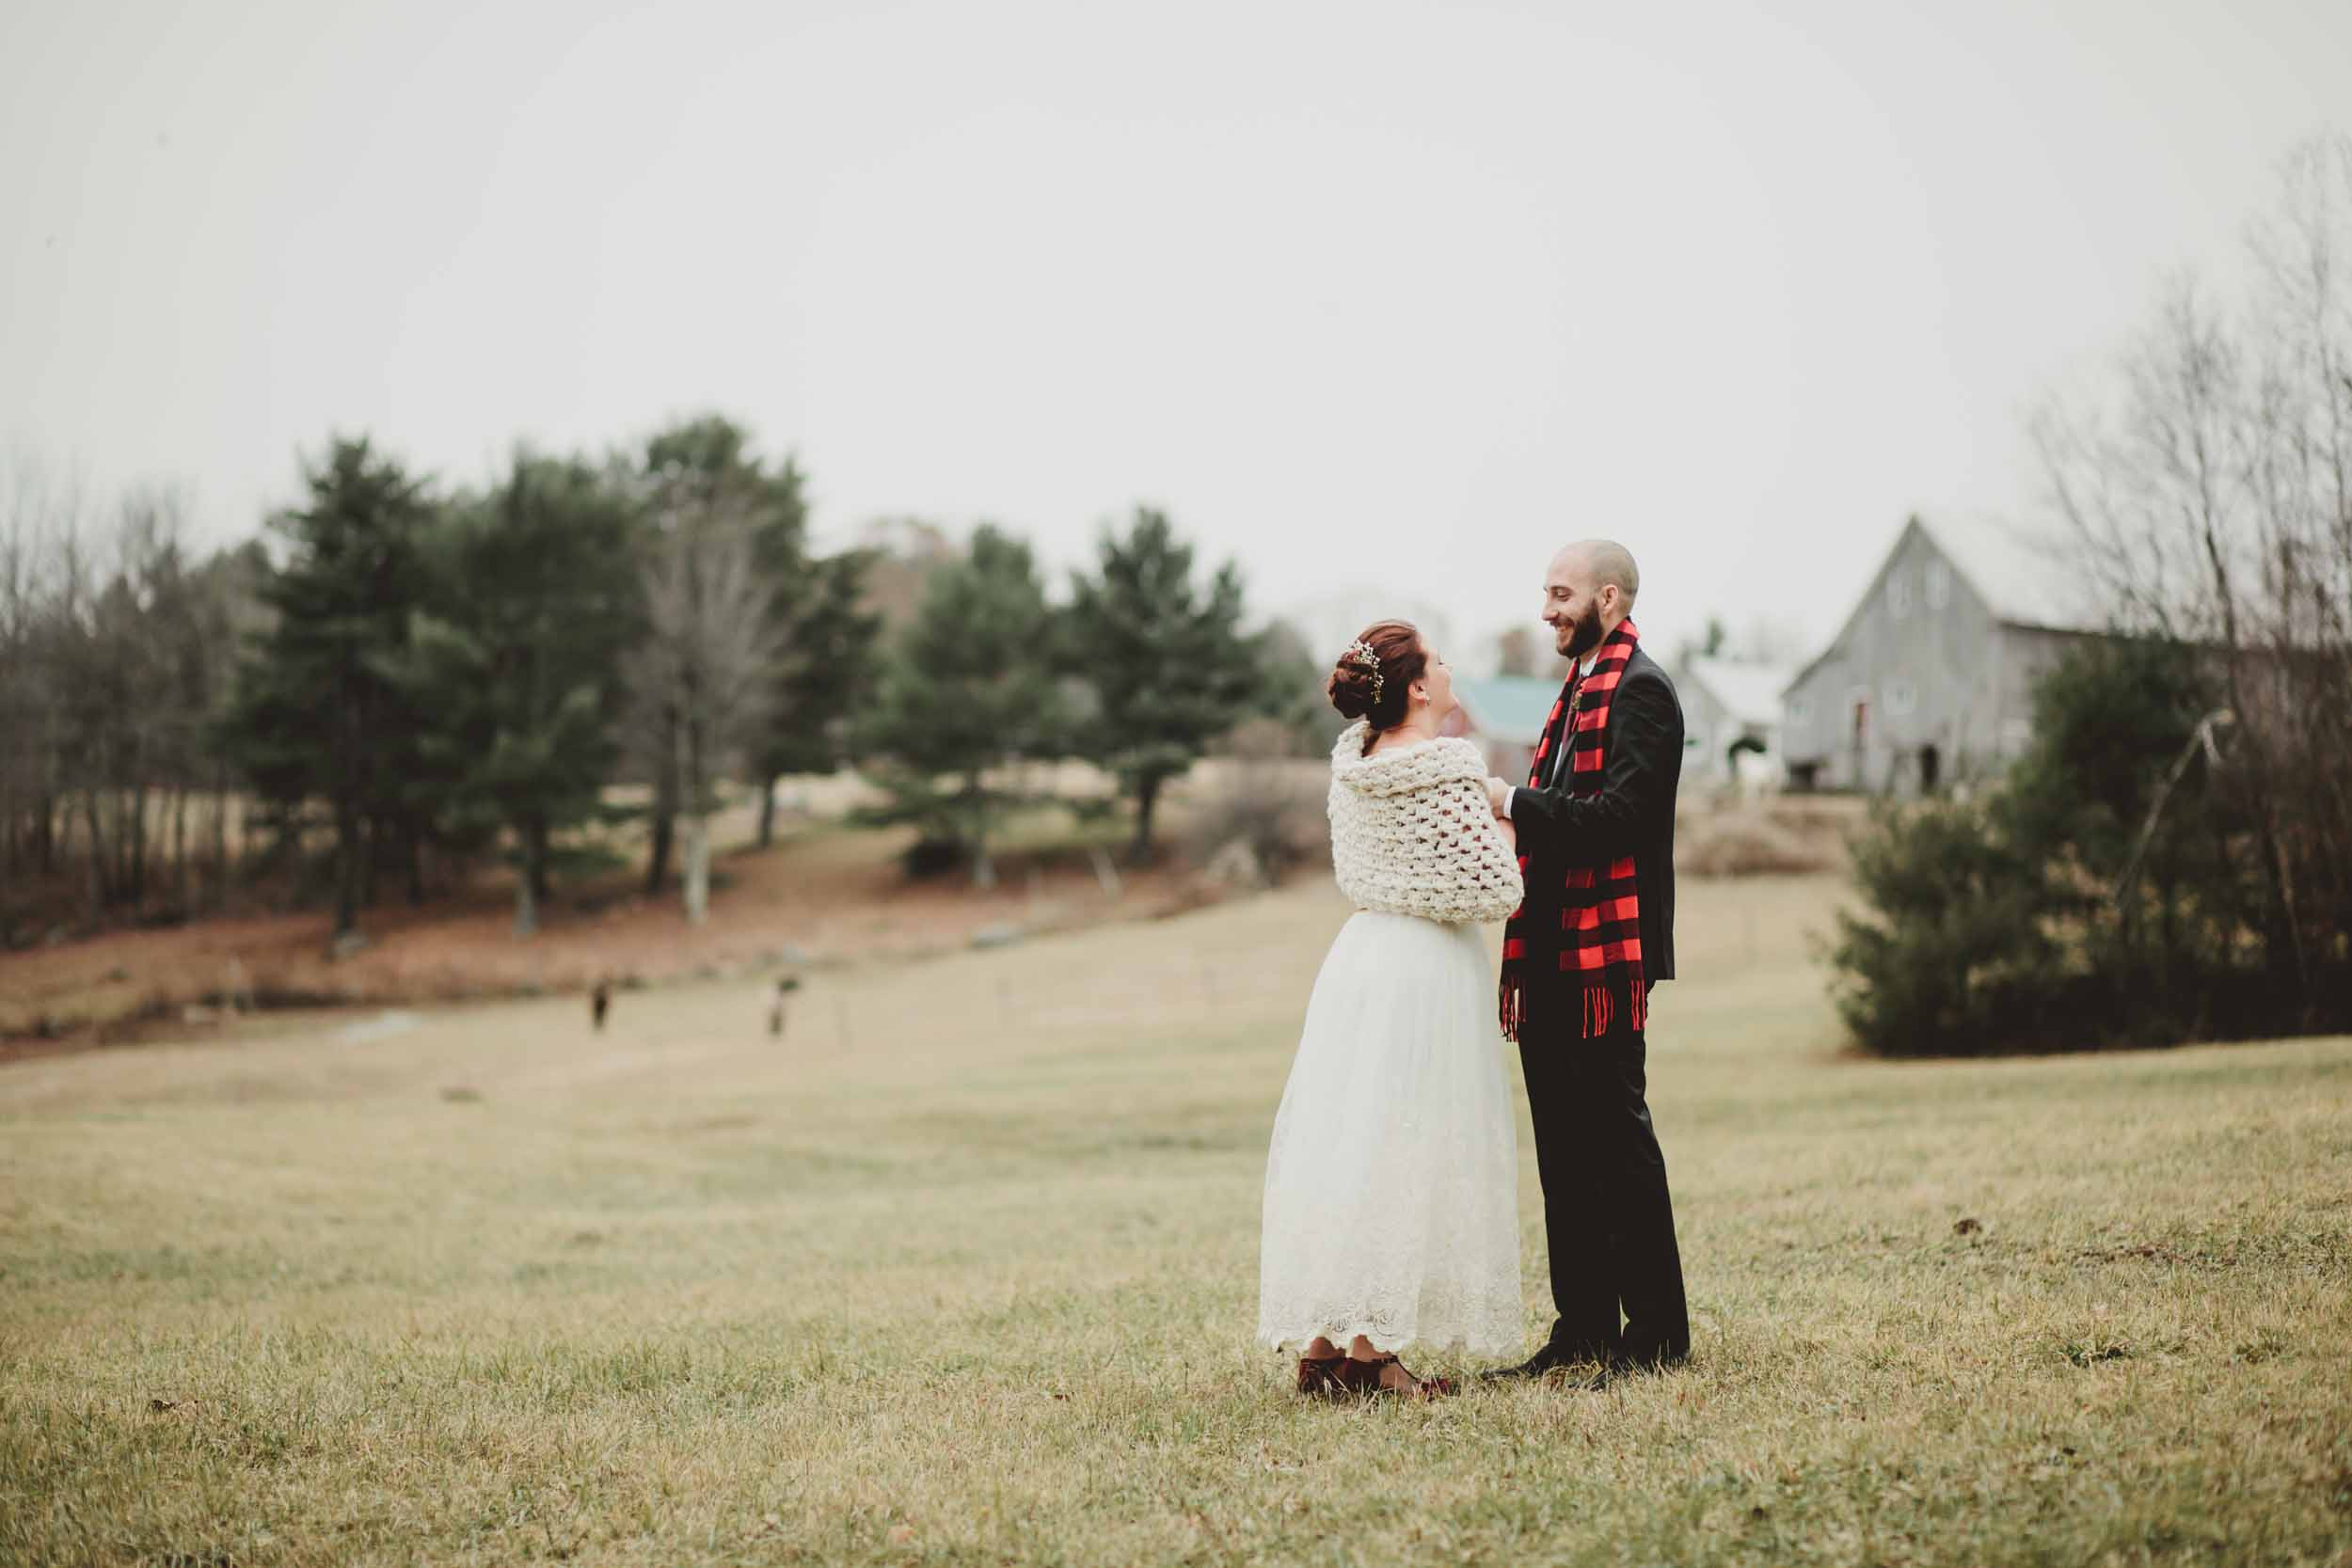 Stone-mountain-arts-wedding101.jpg